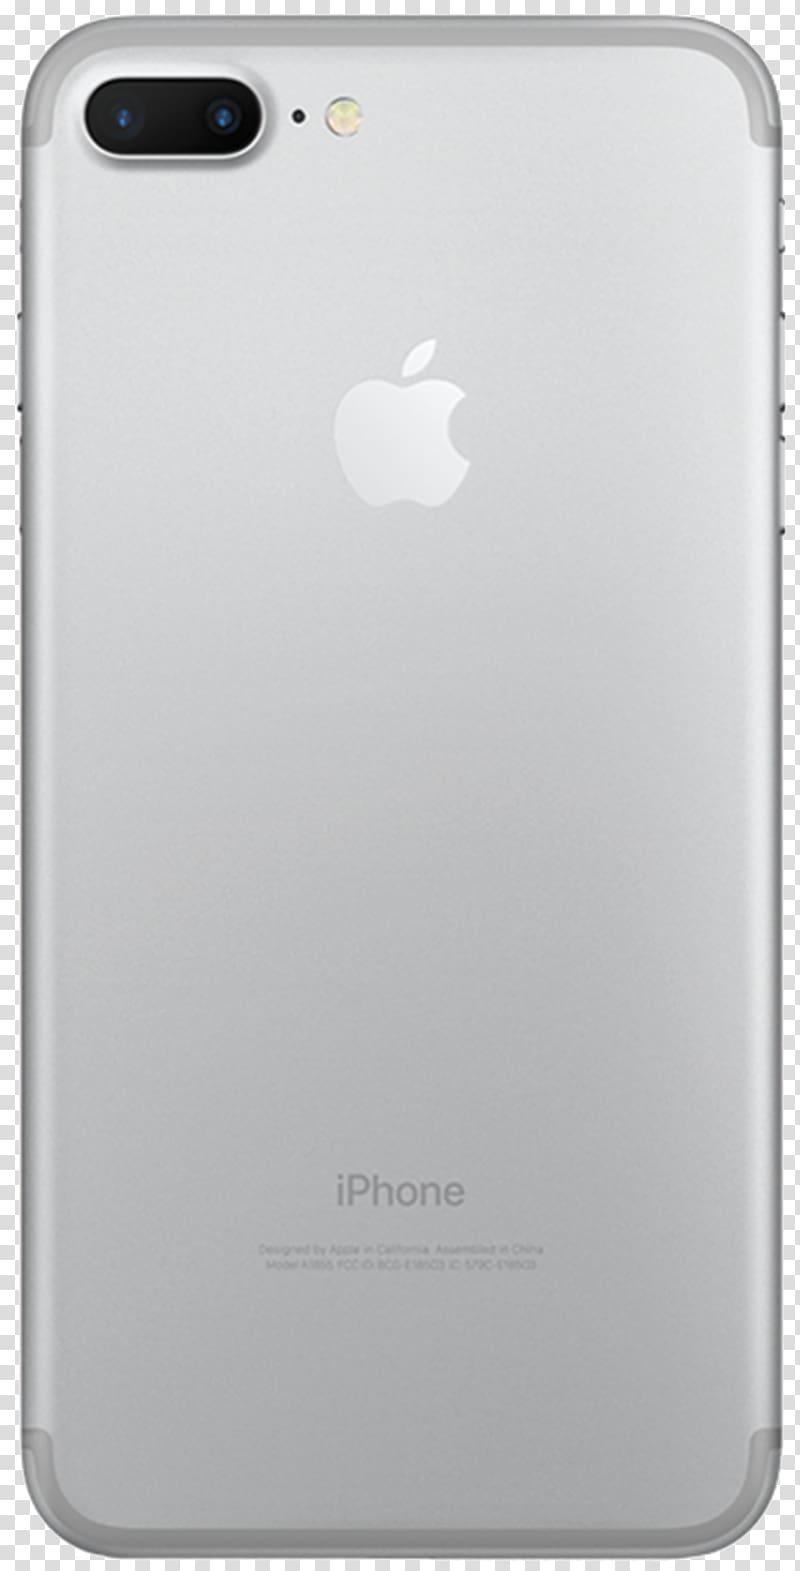 IPhone X Apple iPhone 6S Telephone iPhone 6 Plus, silver.